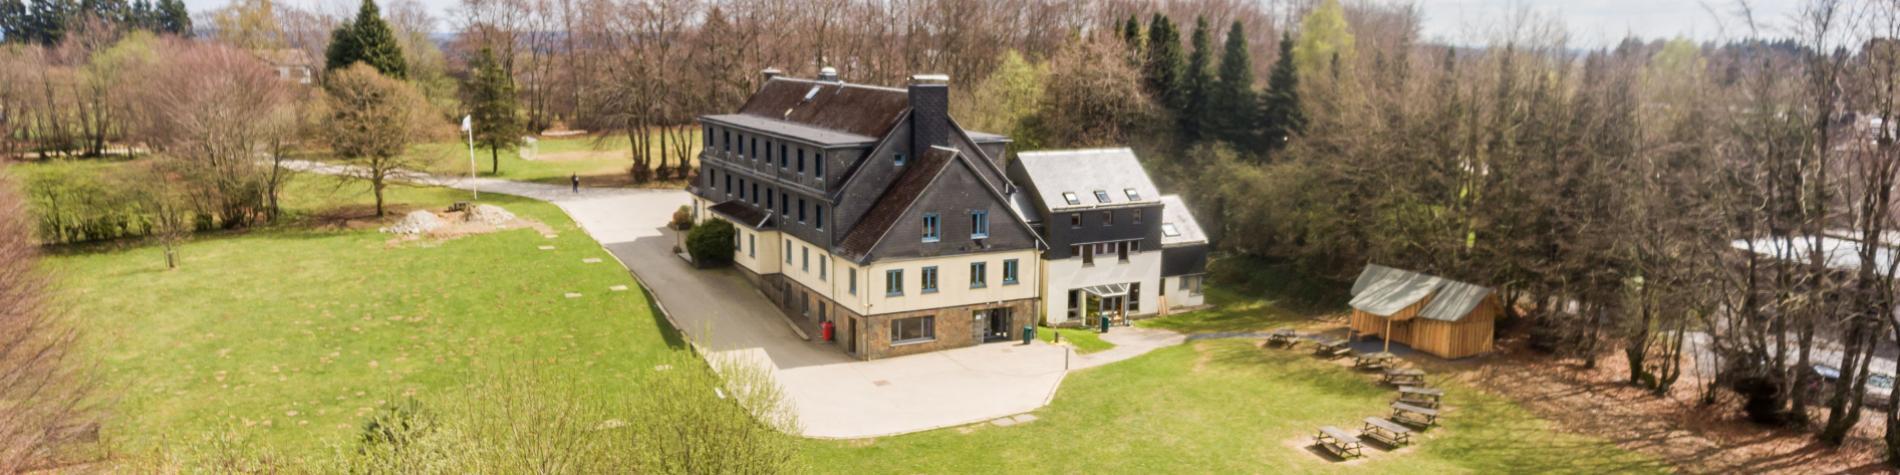 Hébergement - gîte - Auberge - Kaleo – Ardennes - Nature